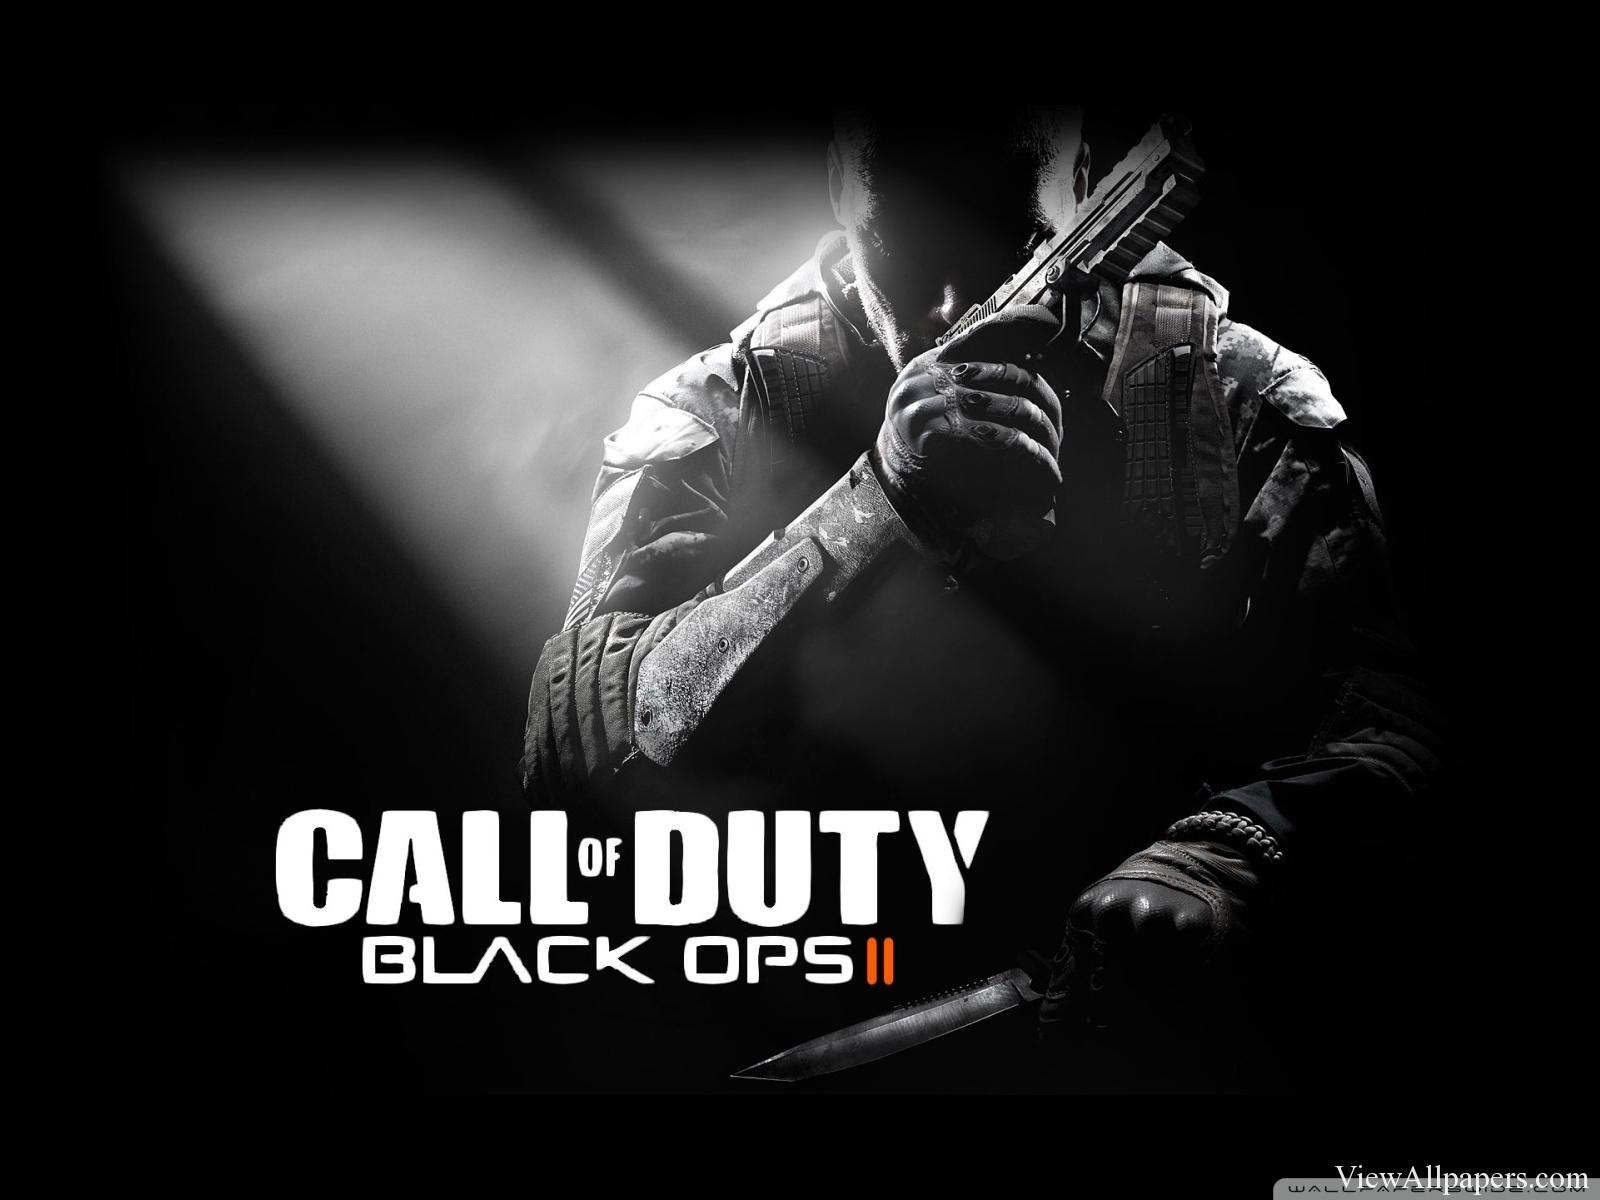 Black Ops 3 Photos High Resolution Wallpaper download Black Ops 1600x1200